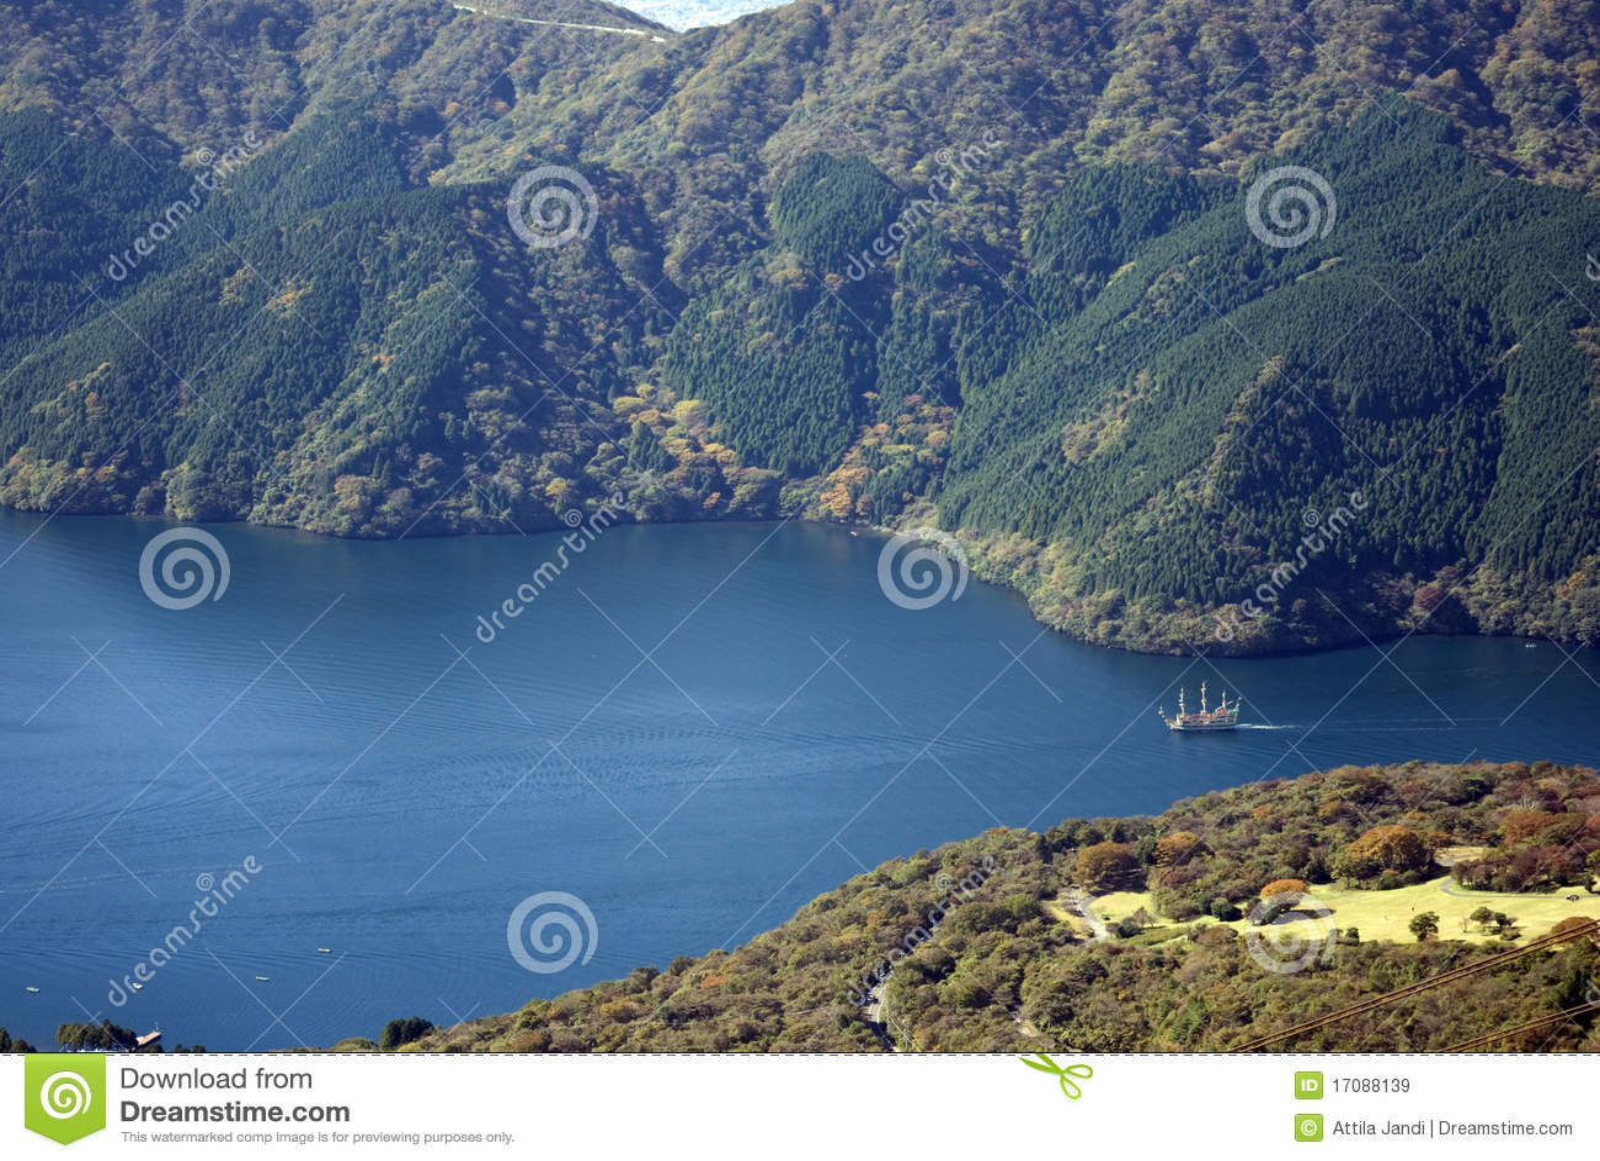 Ashi Japan jezioro